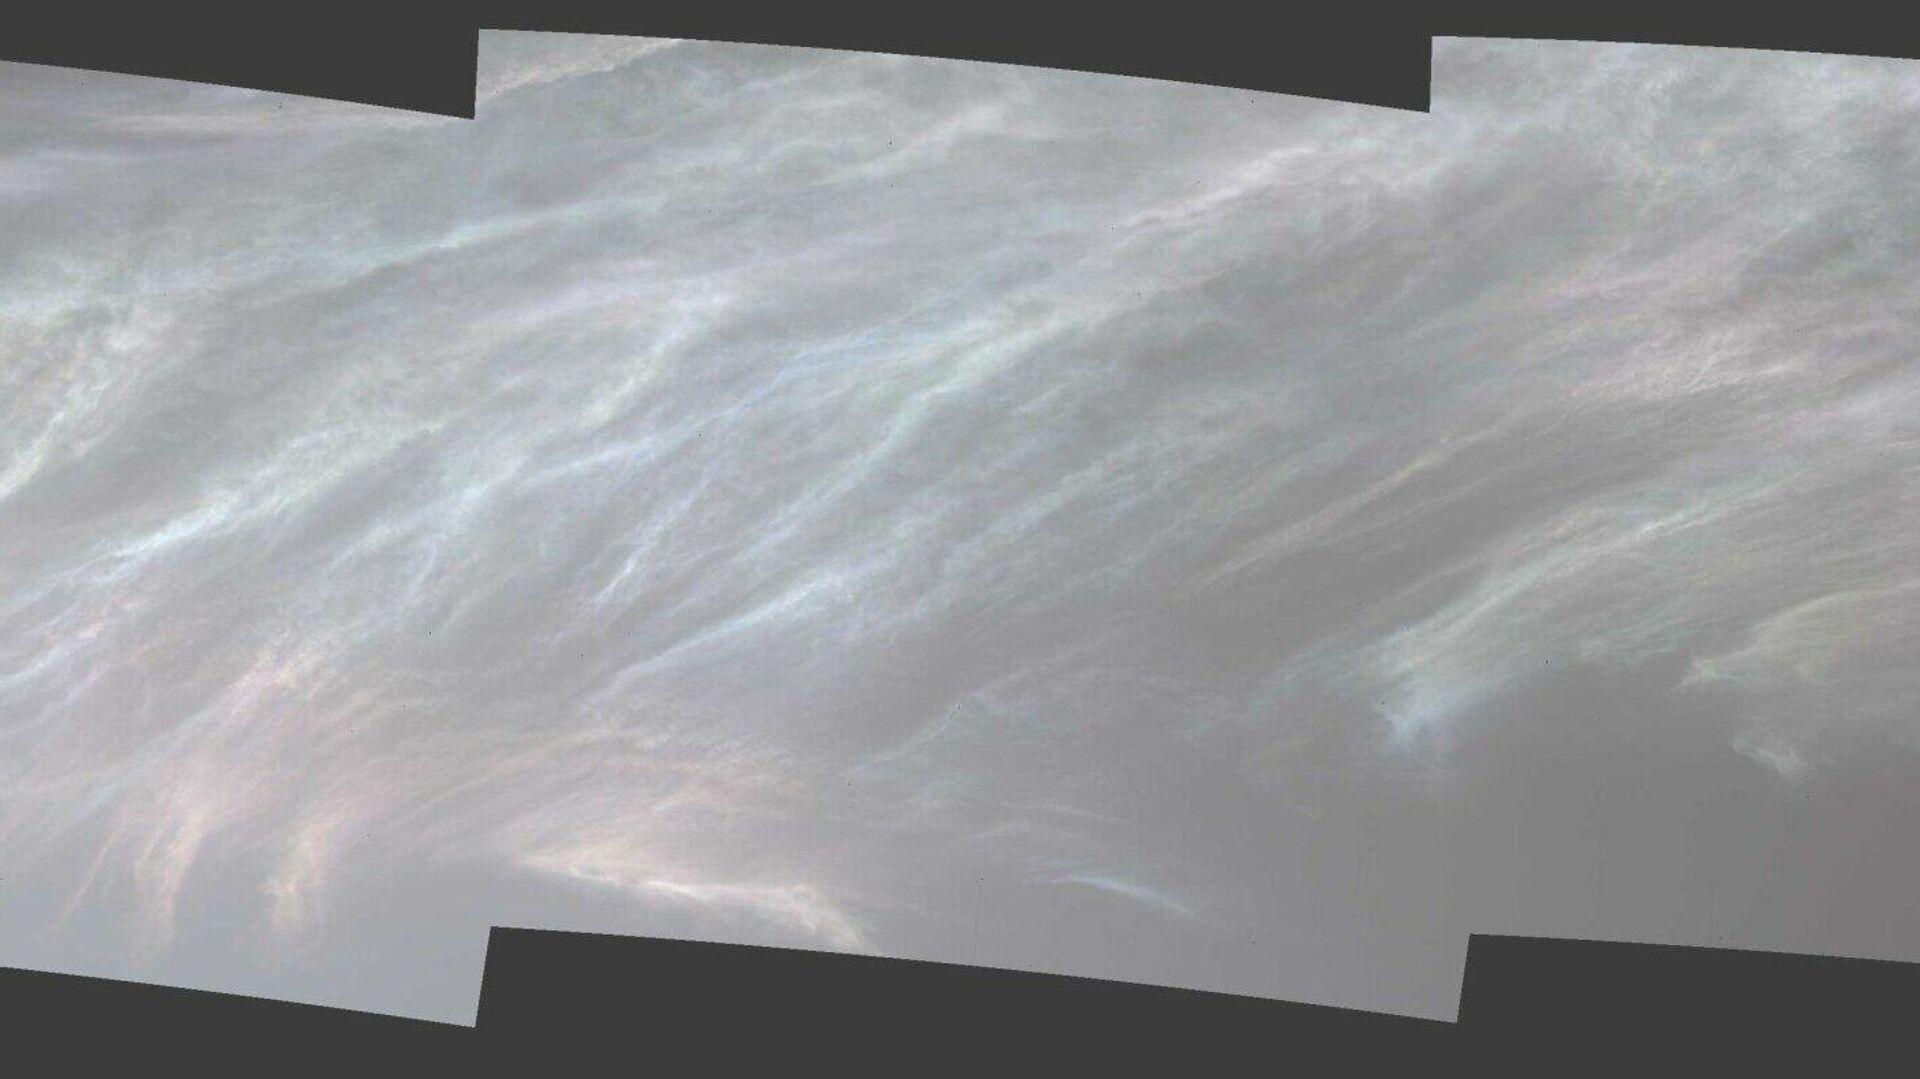 Las 'nubes de nácar' en Marte - Sputnik Mundo, 1920, 29.05.2021